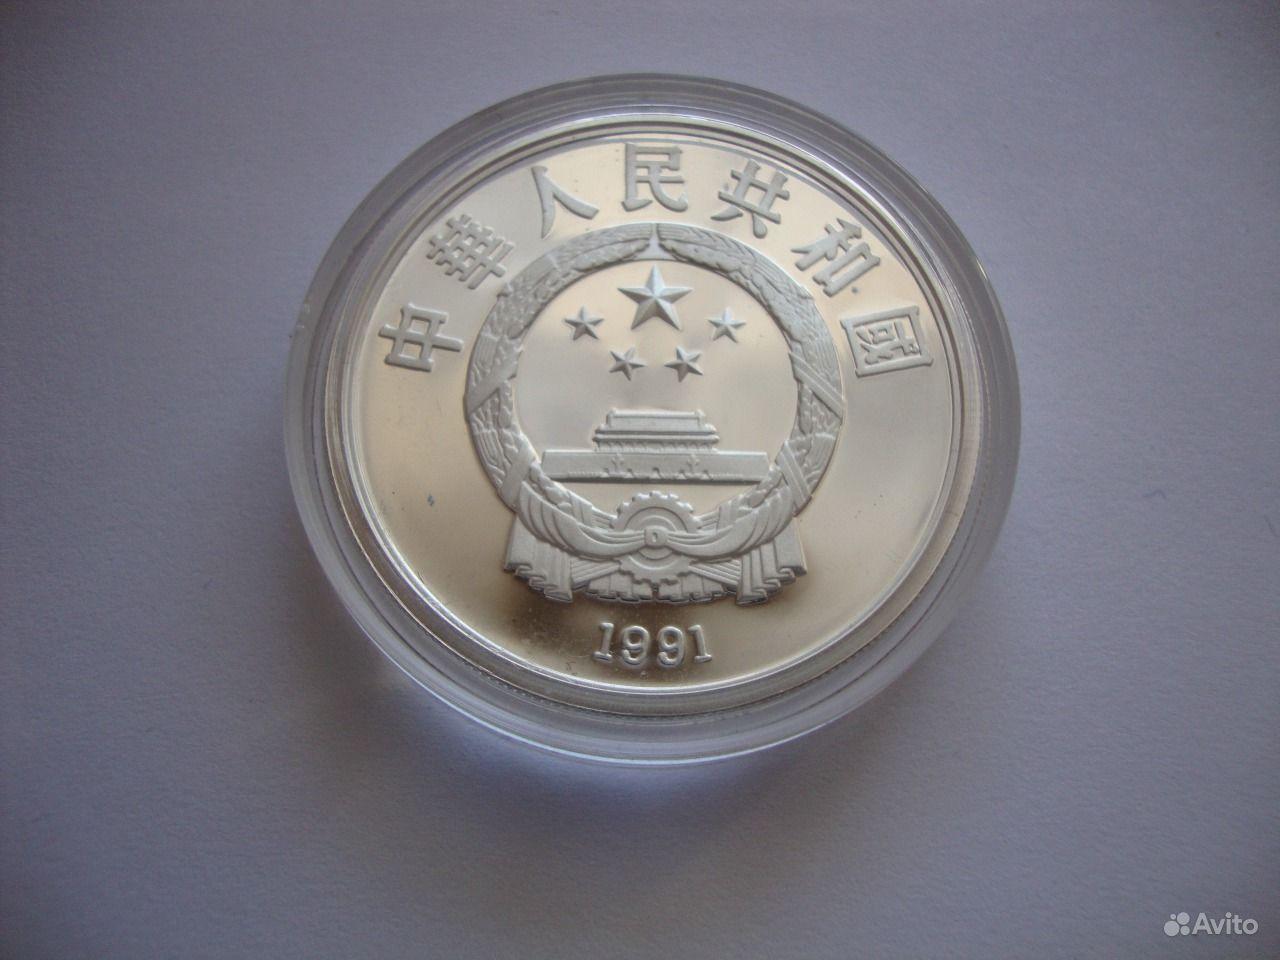 Китай 10 юаней 1991 Олимпиада Теннис Серебро купить в Москве на Avito